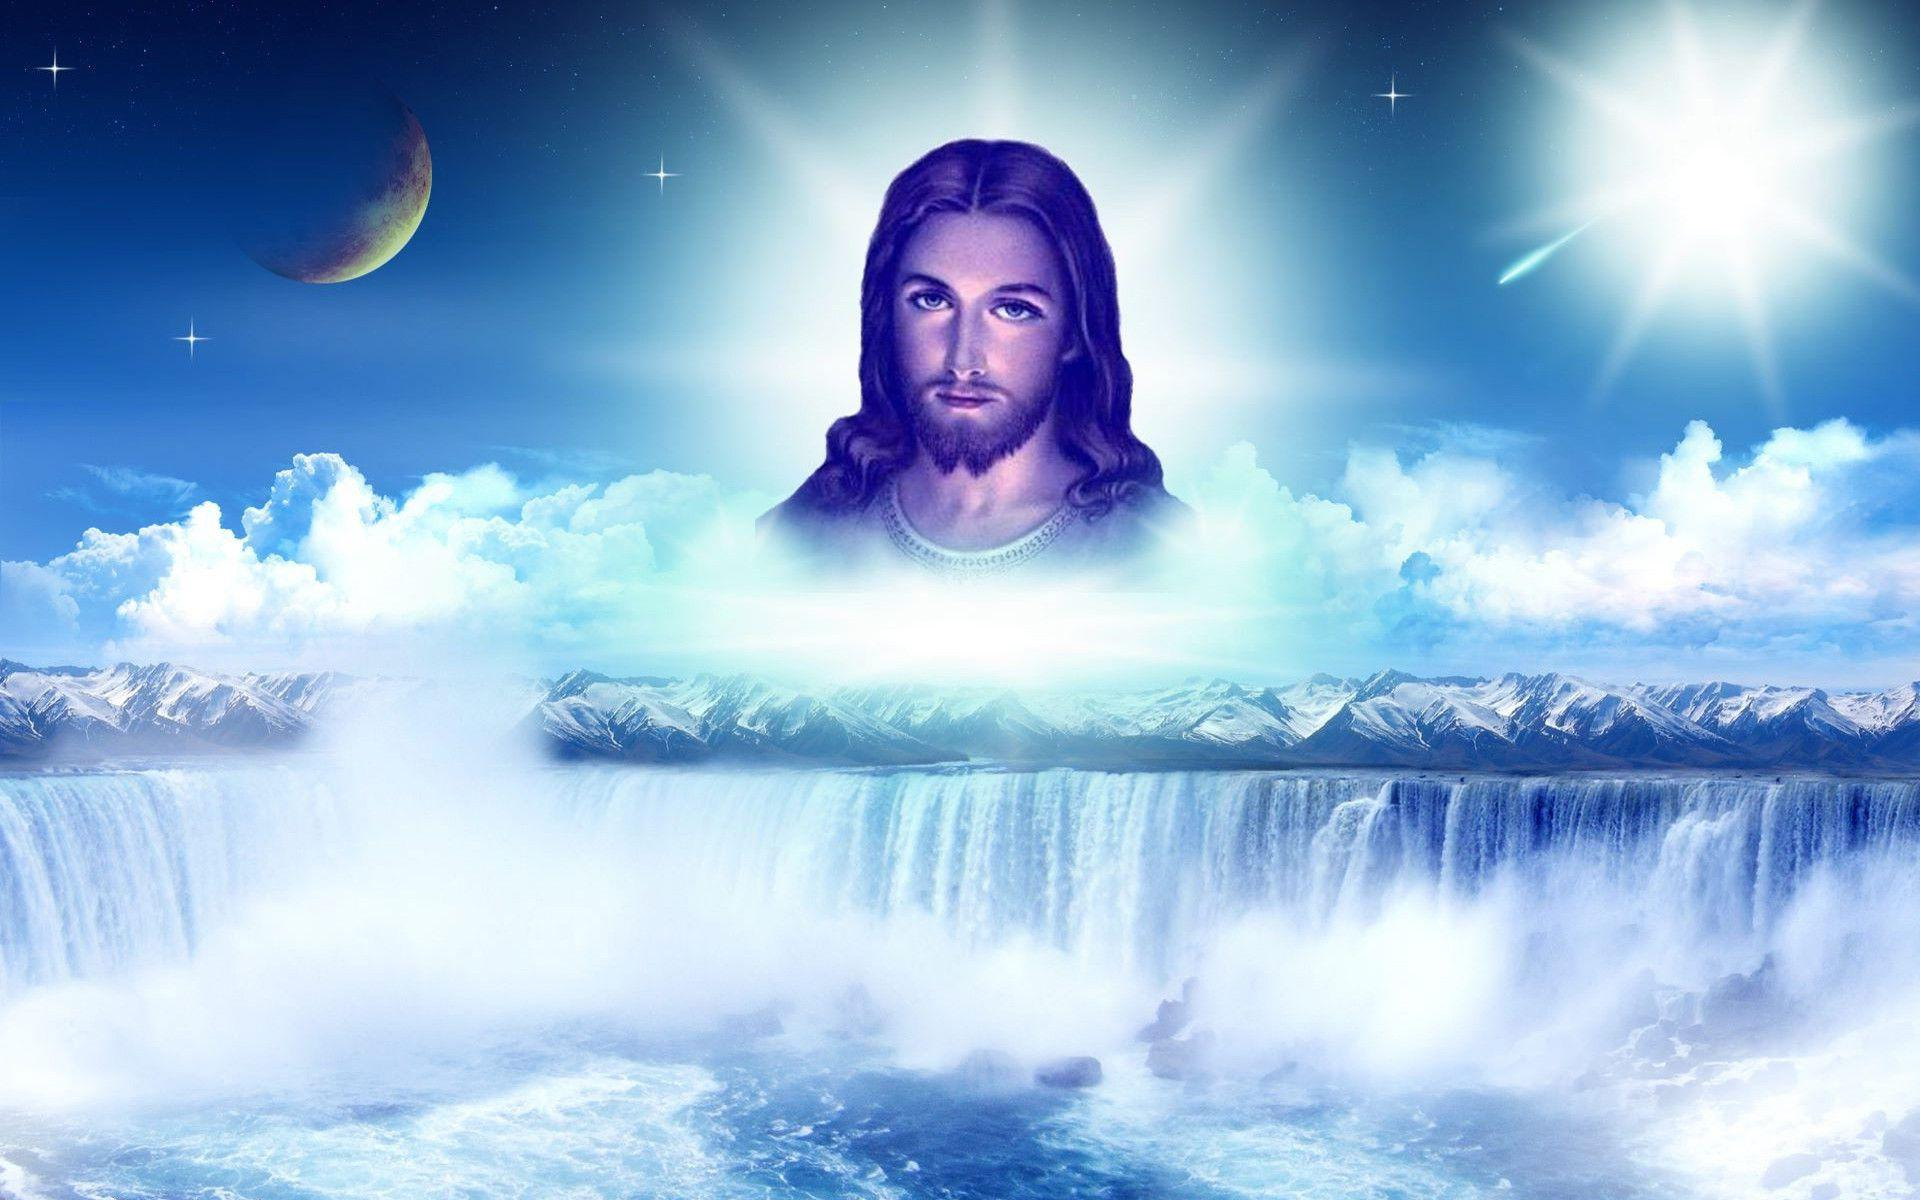 hd image jesus christ - photo #24